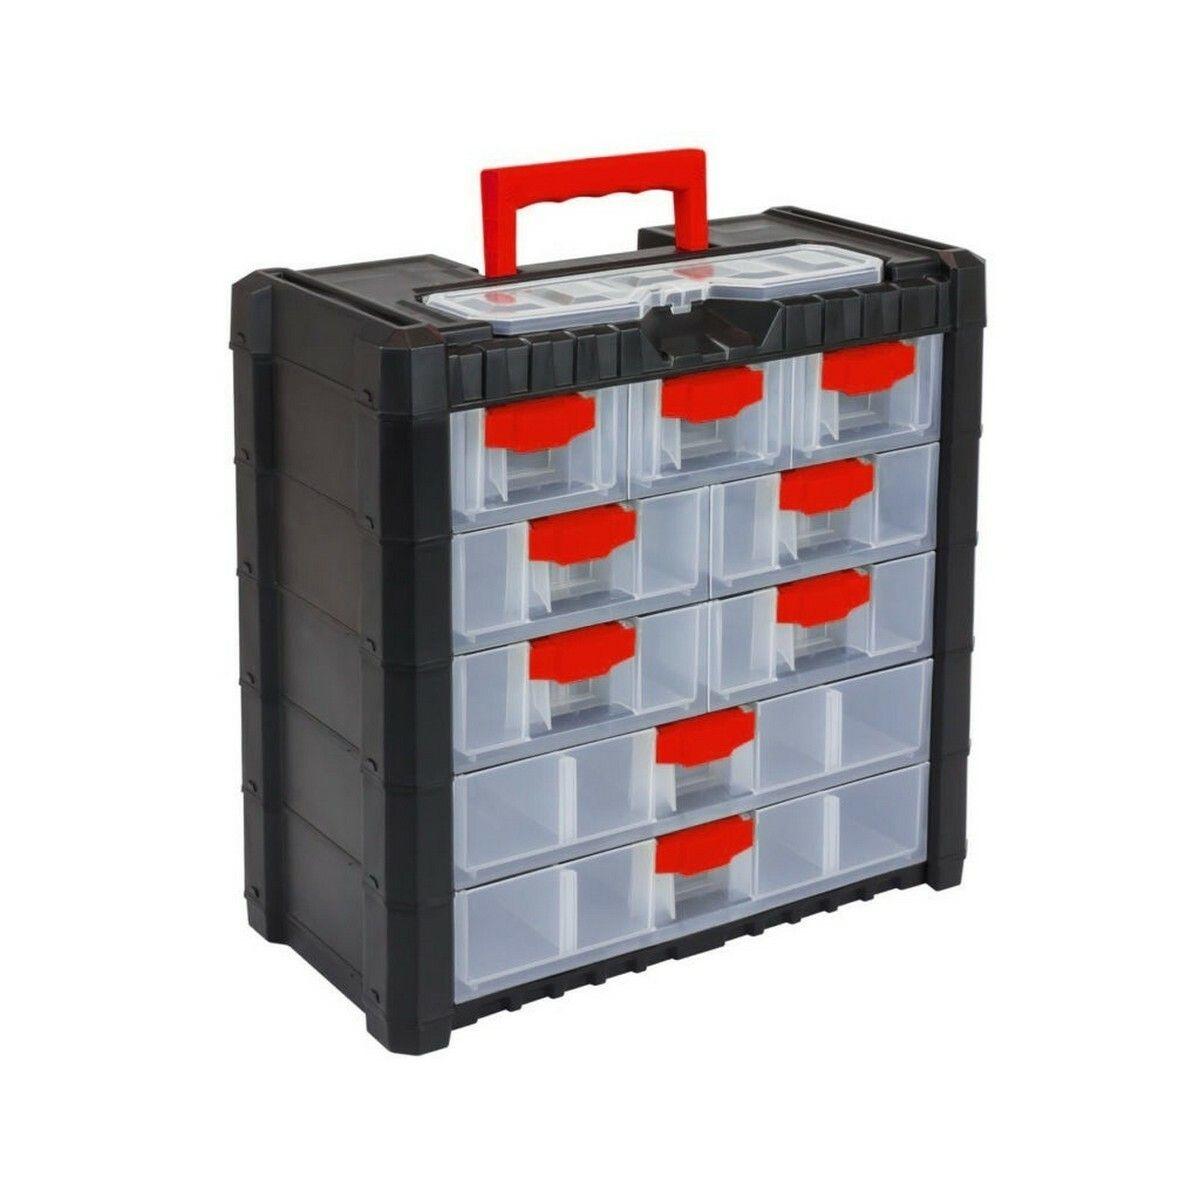 Plastový organizér na nářadí závěsný MULTICASECARGO 400x200x392, 9 zásuvek PROSPERPLAST